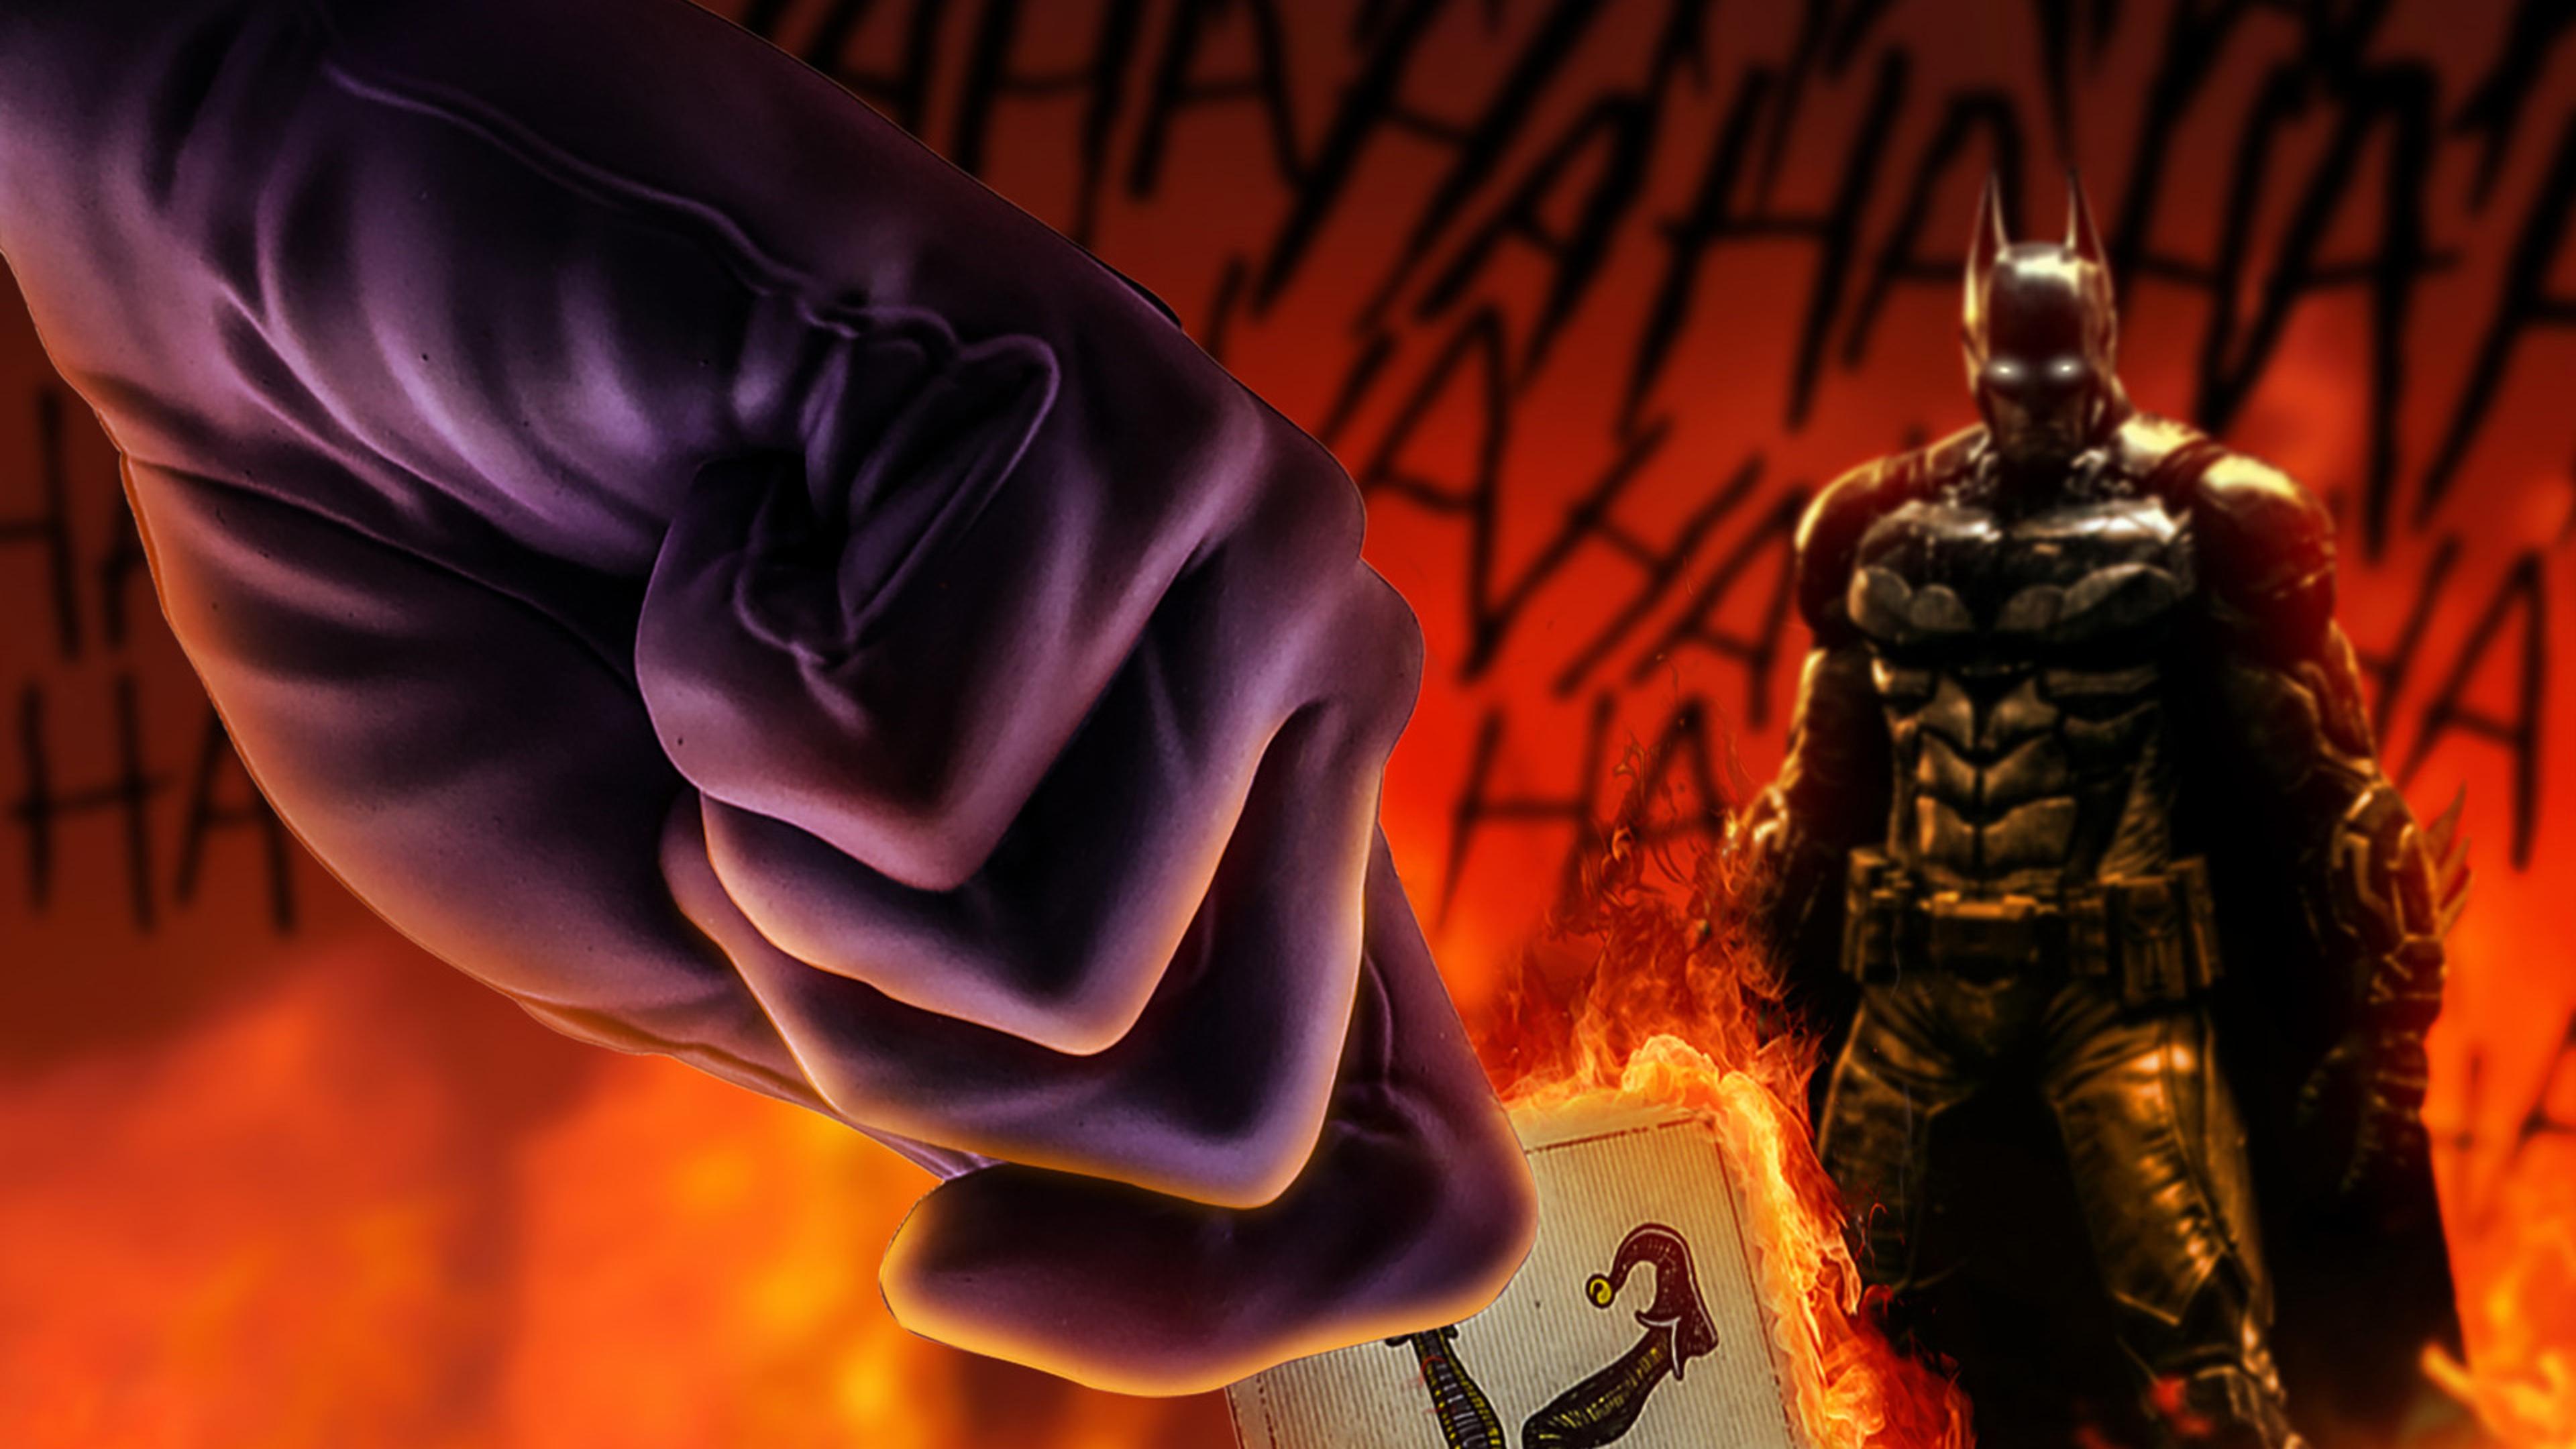 3840x2160 Joker With His Card Batman Art 4k HD 4k ...